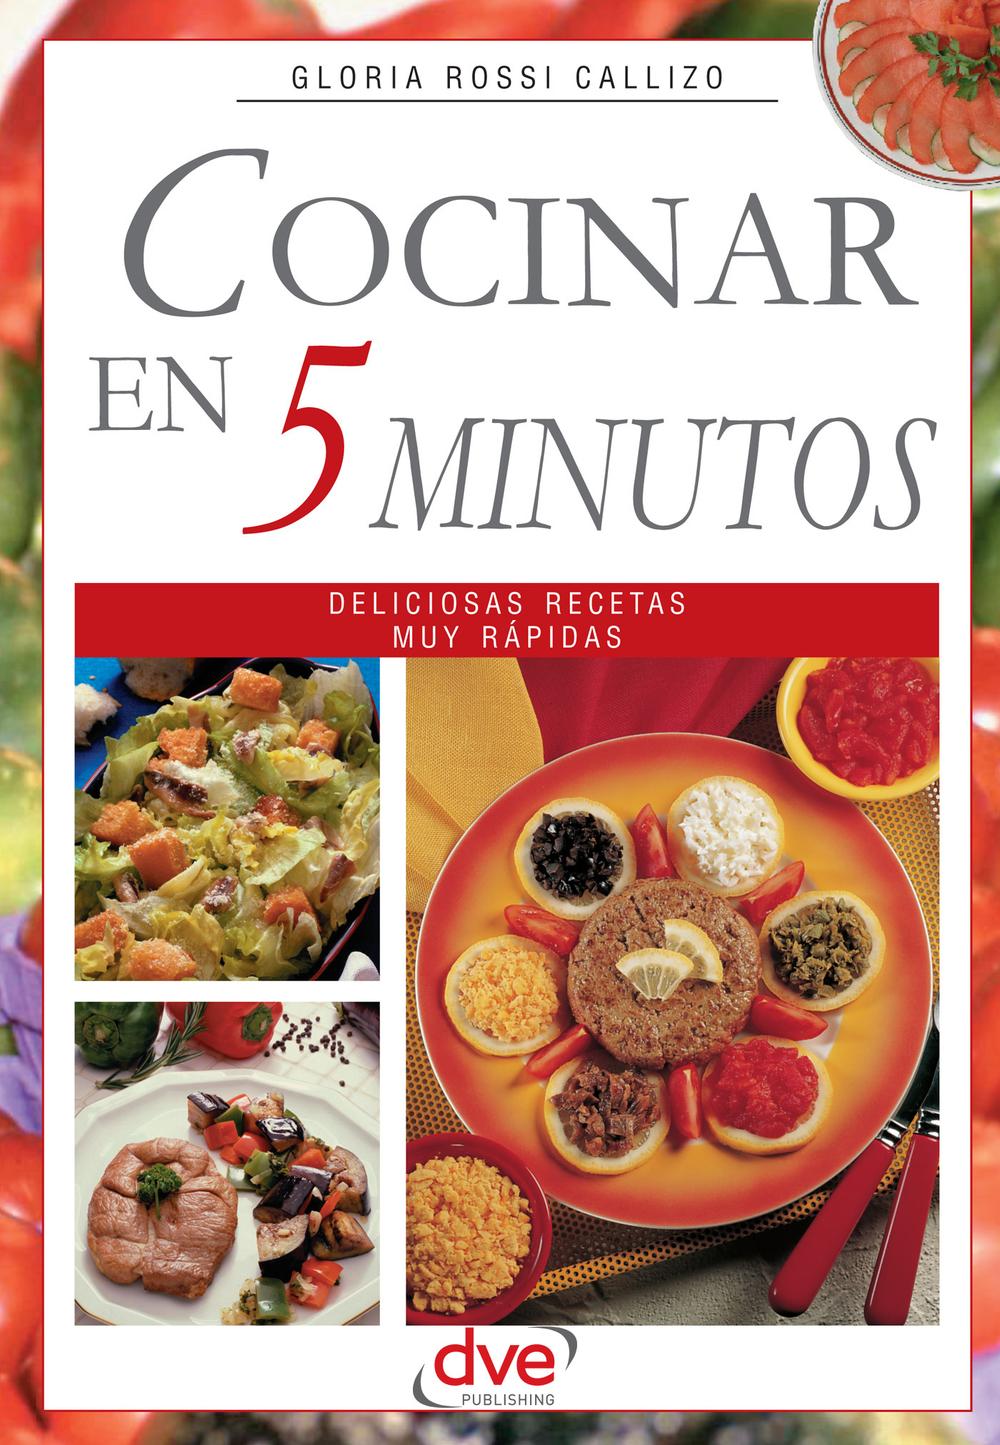 Cocinar en 5 minutos